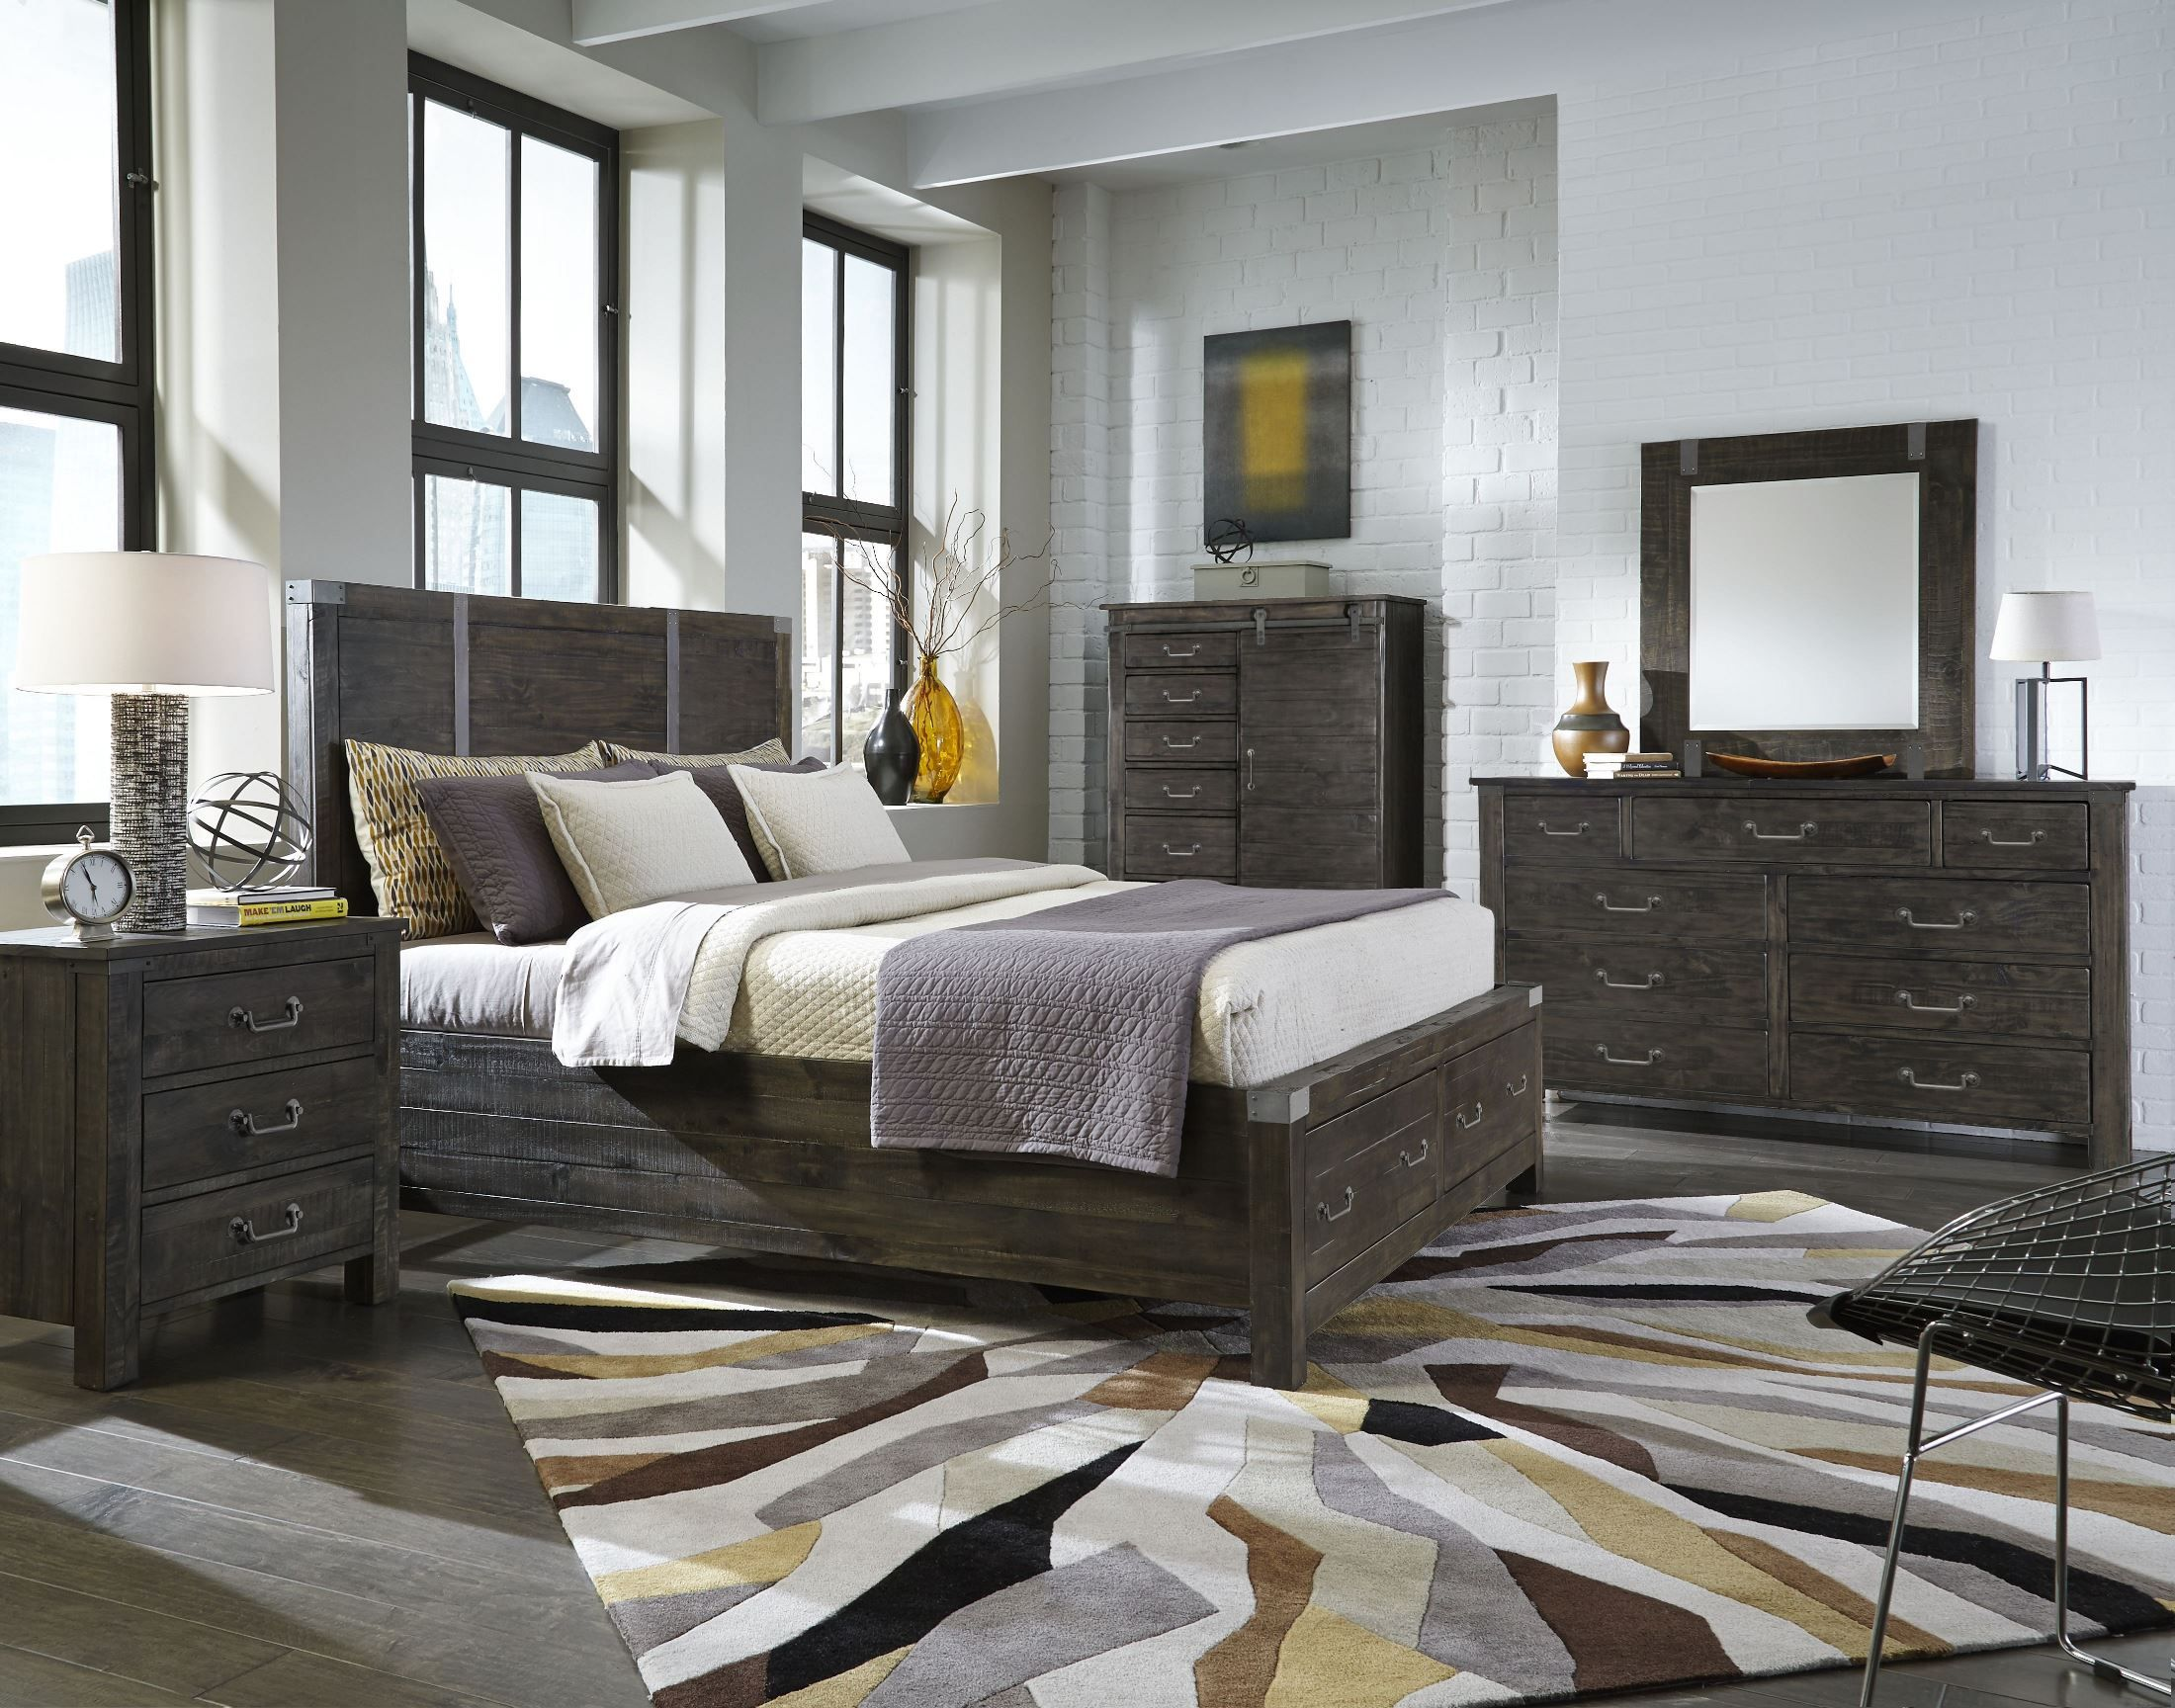 Willow Upholstered Bedroom Set Weathered Grey Upholstered Bedroom Set King Bedroom Sets Upholstered Bedroom